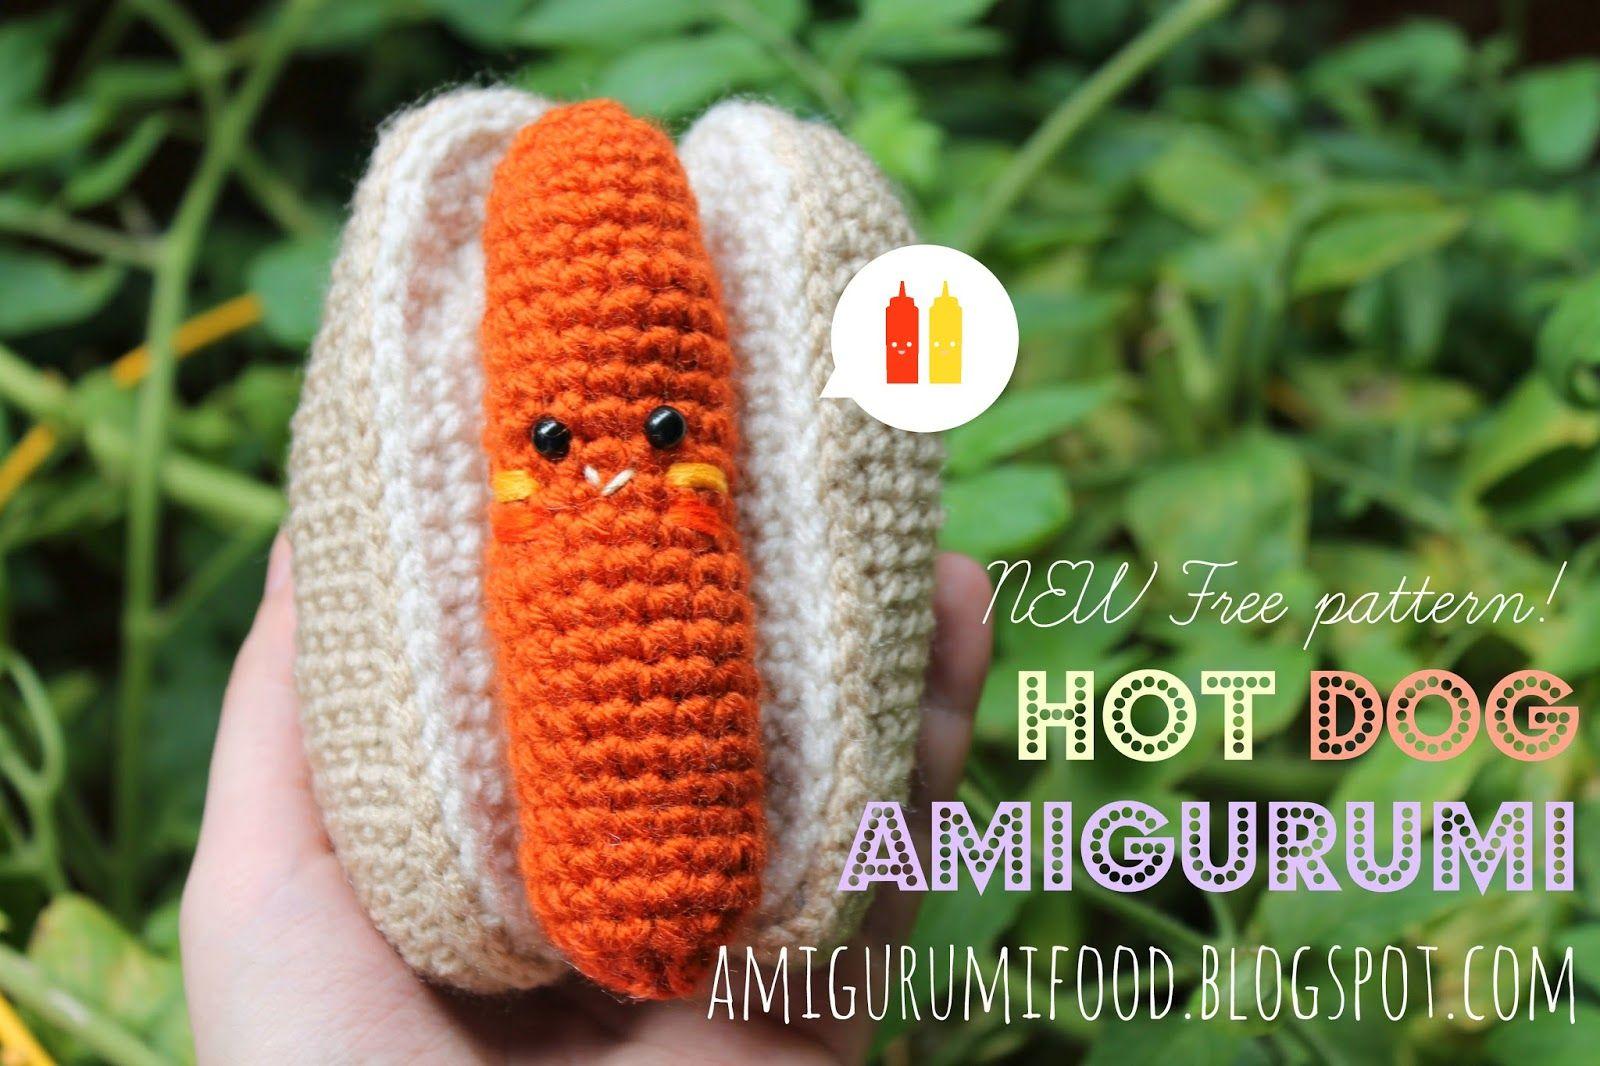 Hot Dog Free Pattern! (English) | Crochet amigurumi | Pinterest